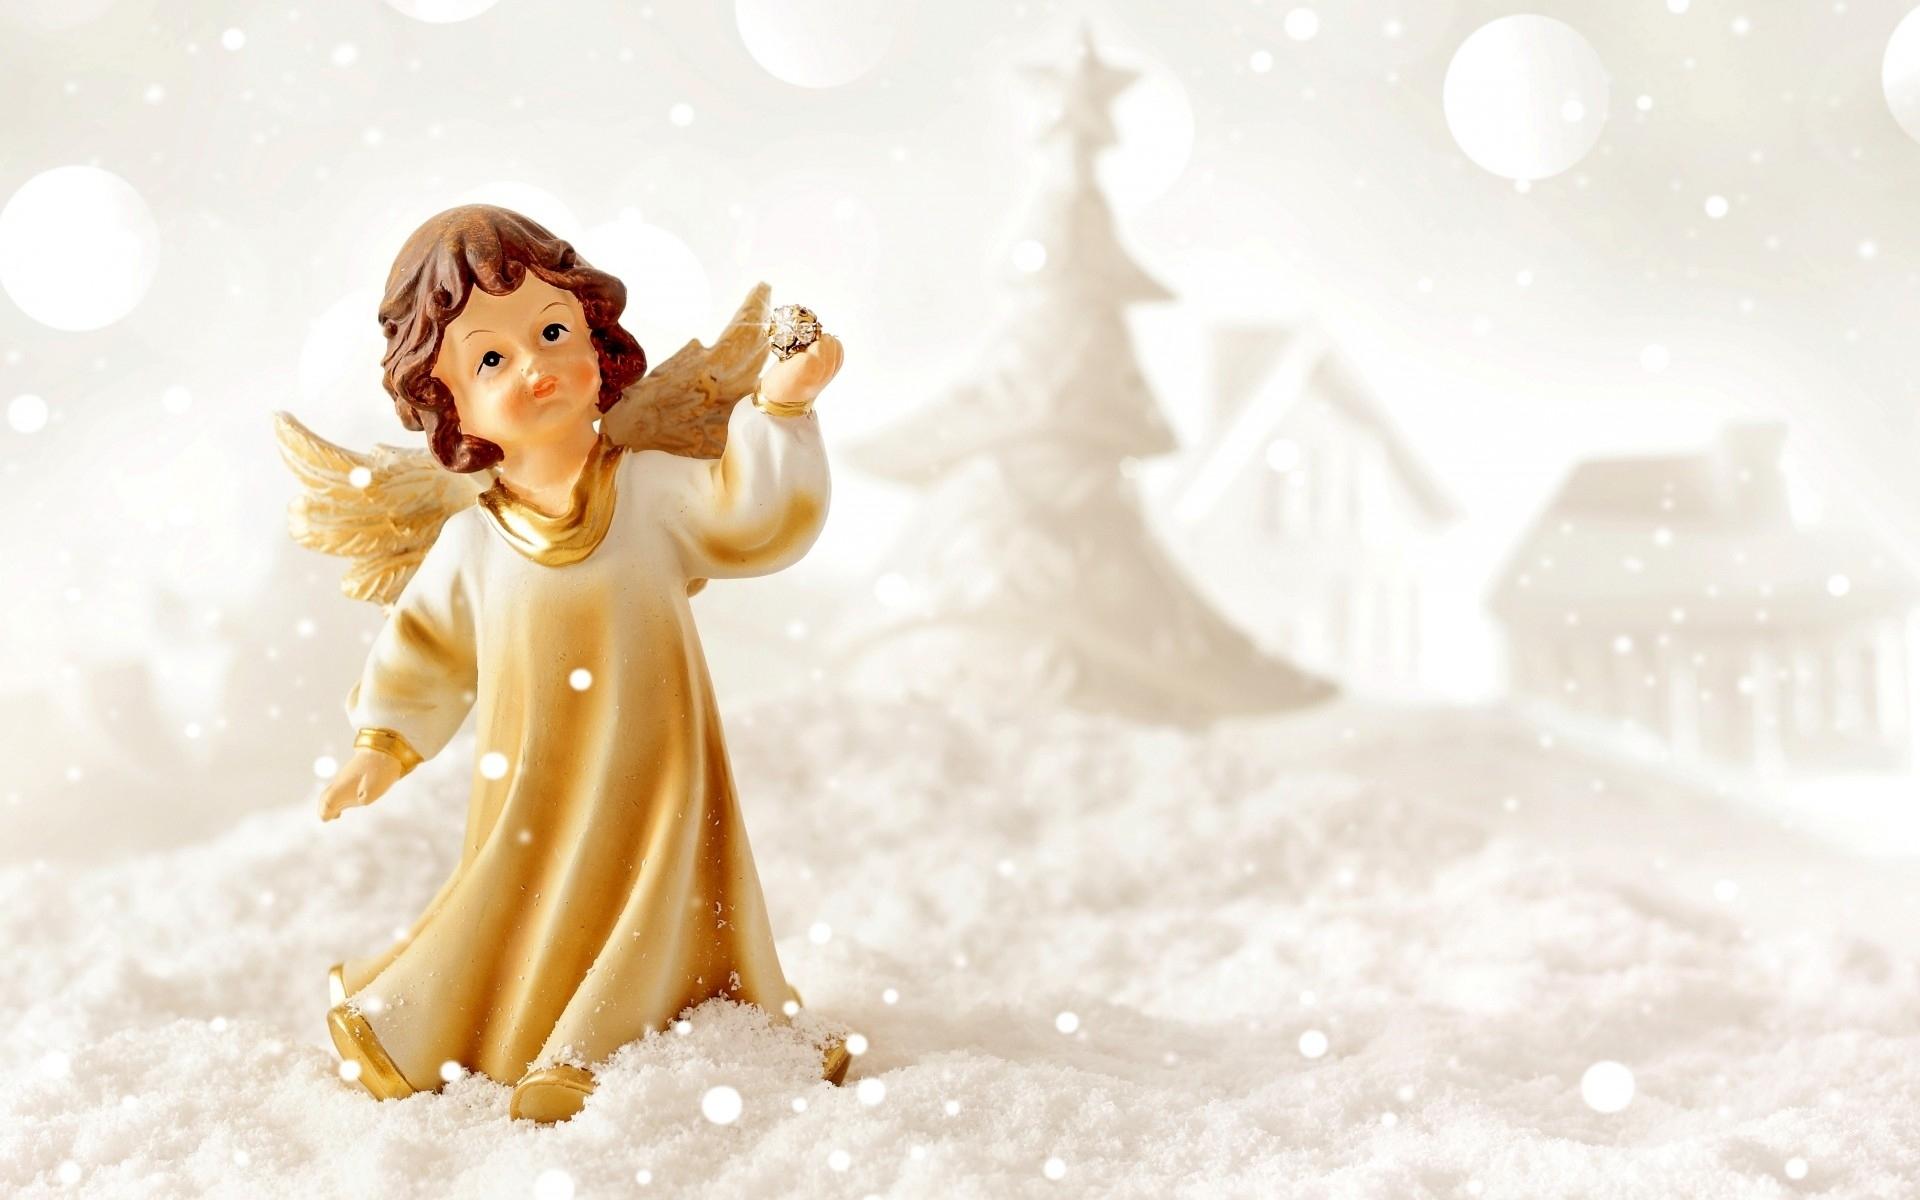 Angel Figurine Tree White 1920x1200